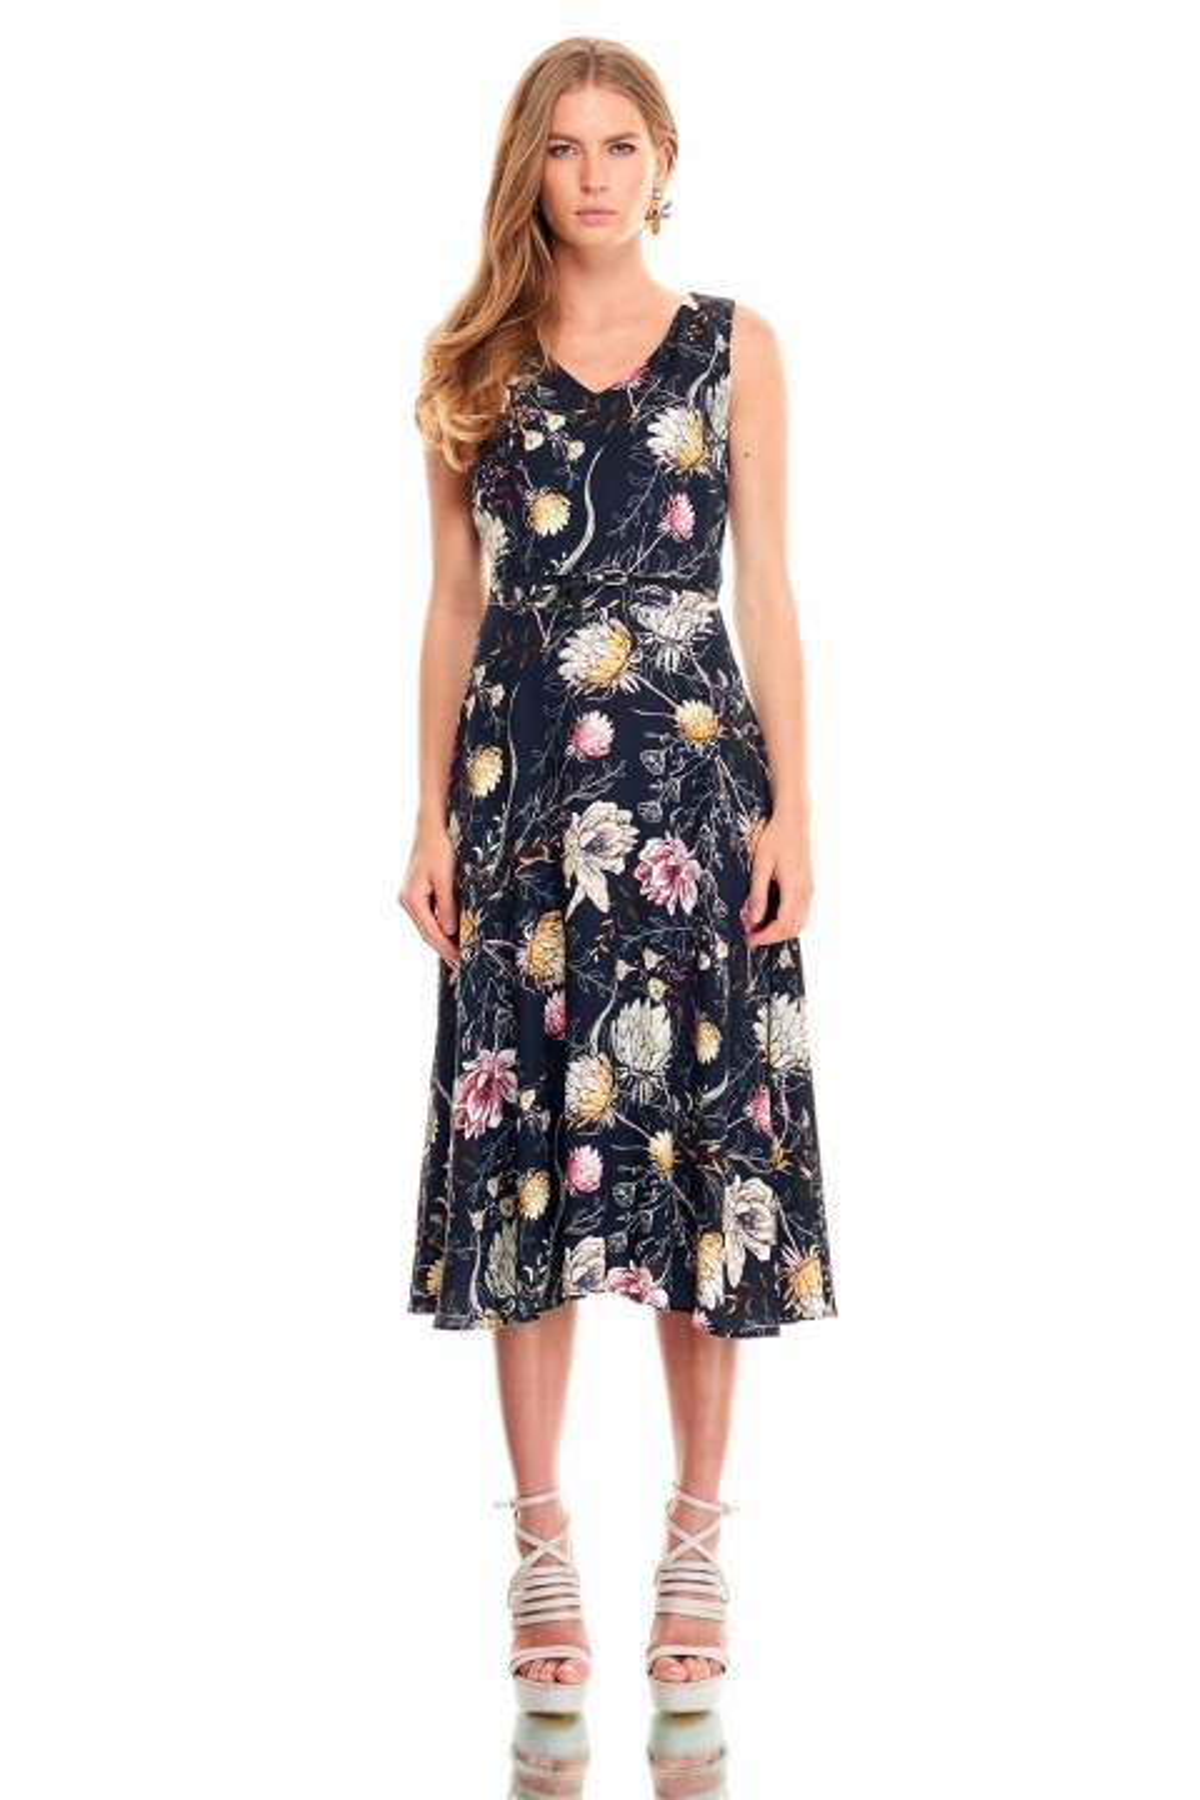 2ed0e8b388767 ... Ekol V Yaka Çiçek Desenli Elbise